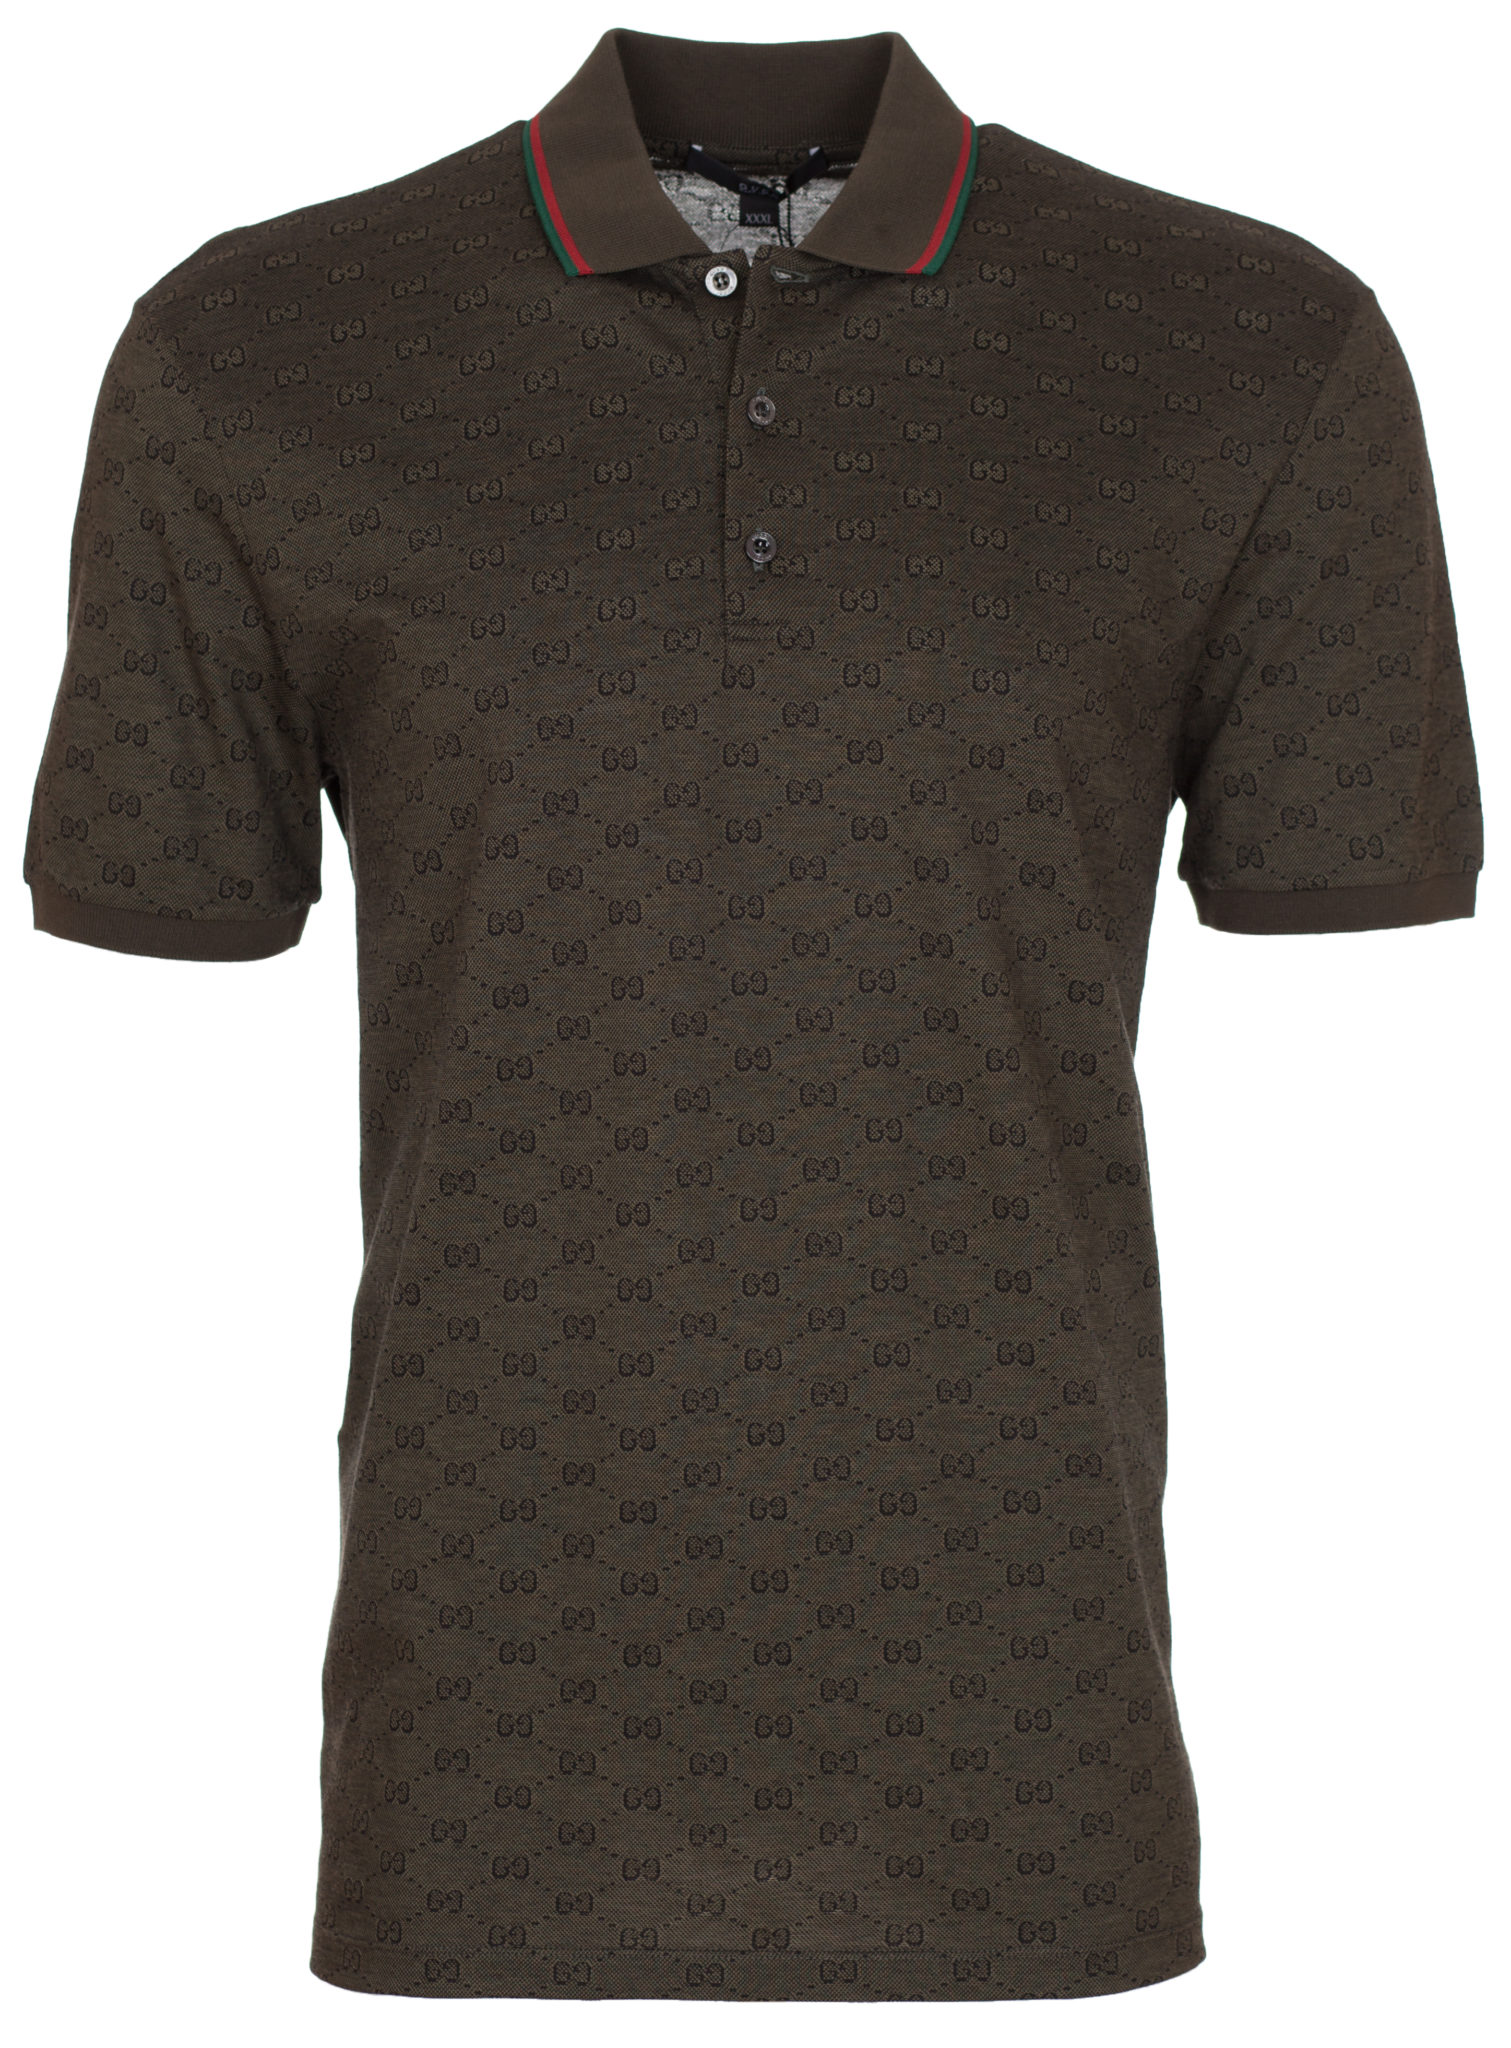 f2d266036 Gucci Men's Military Green GG Jacquard Cotton Pique Polo Shirt